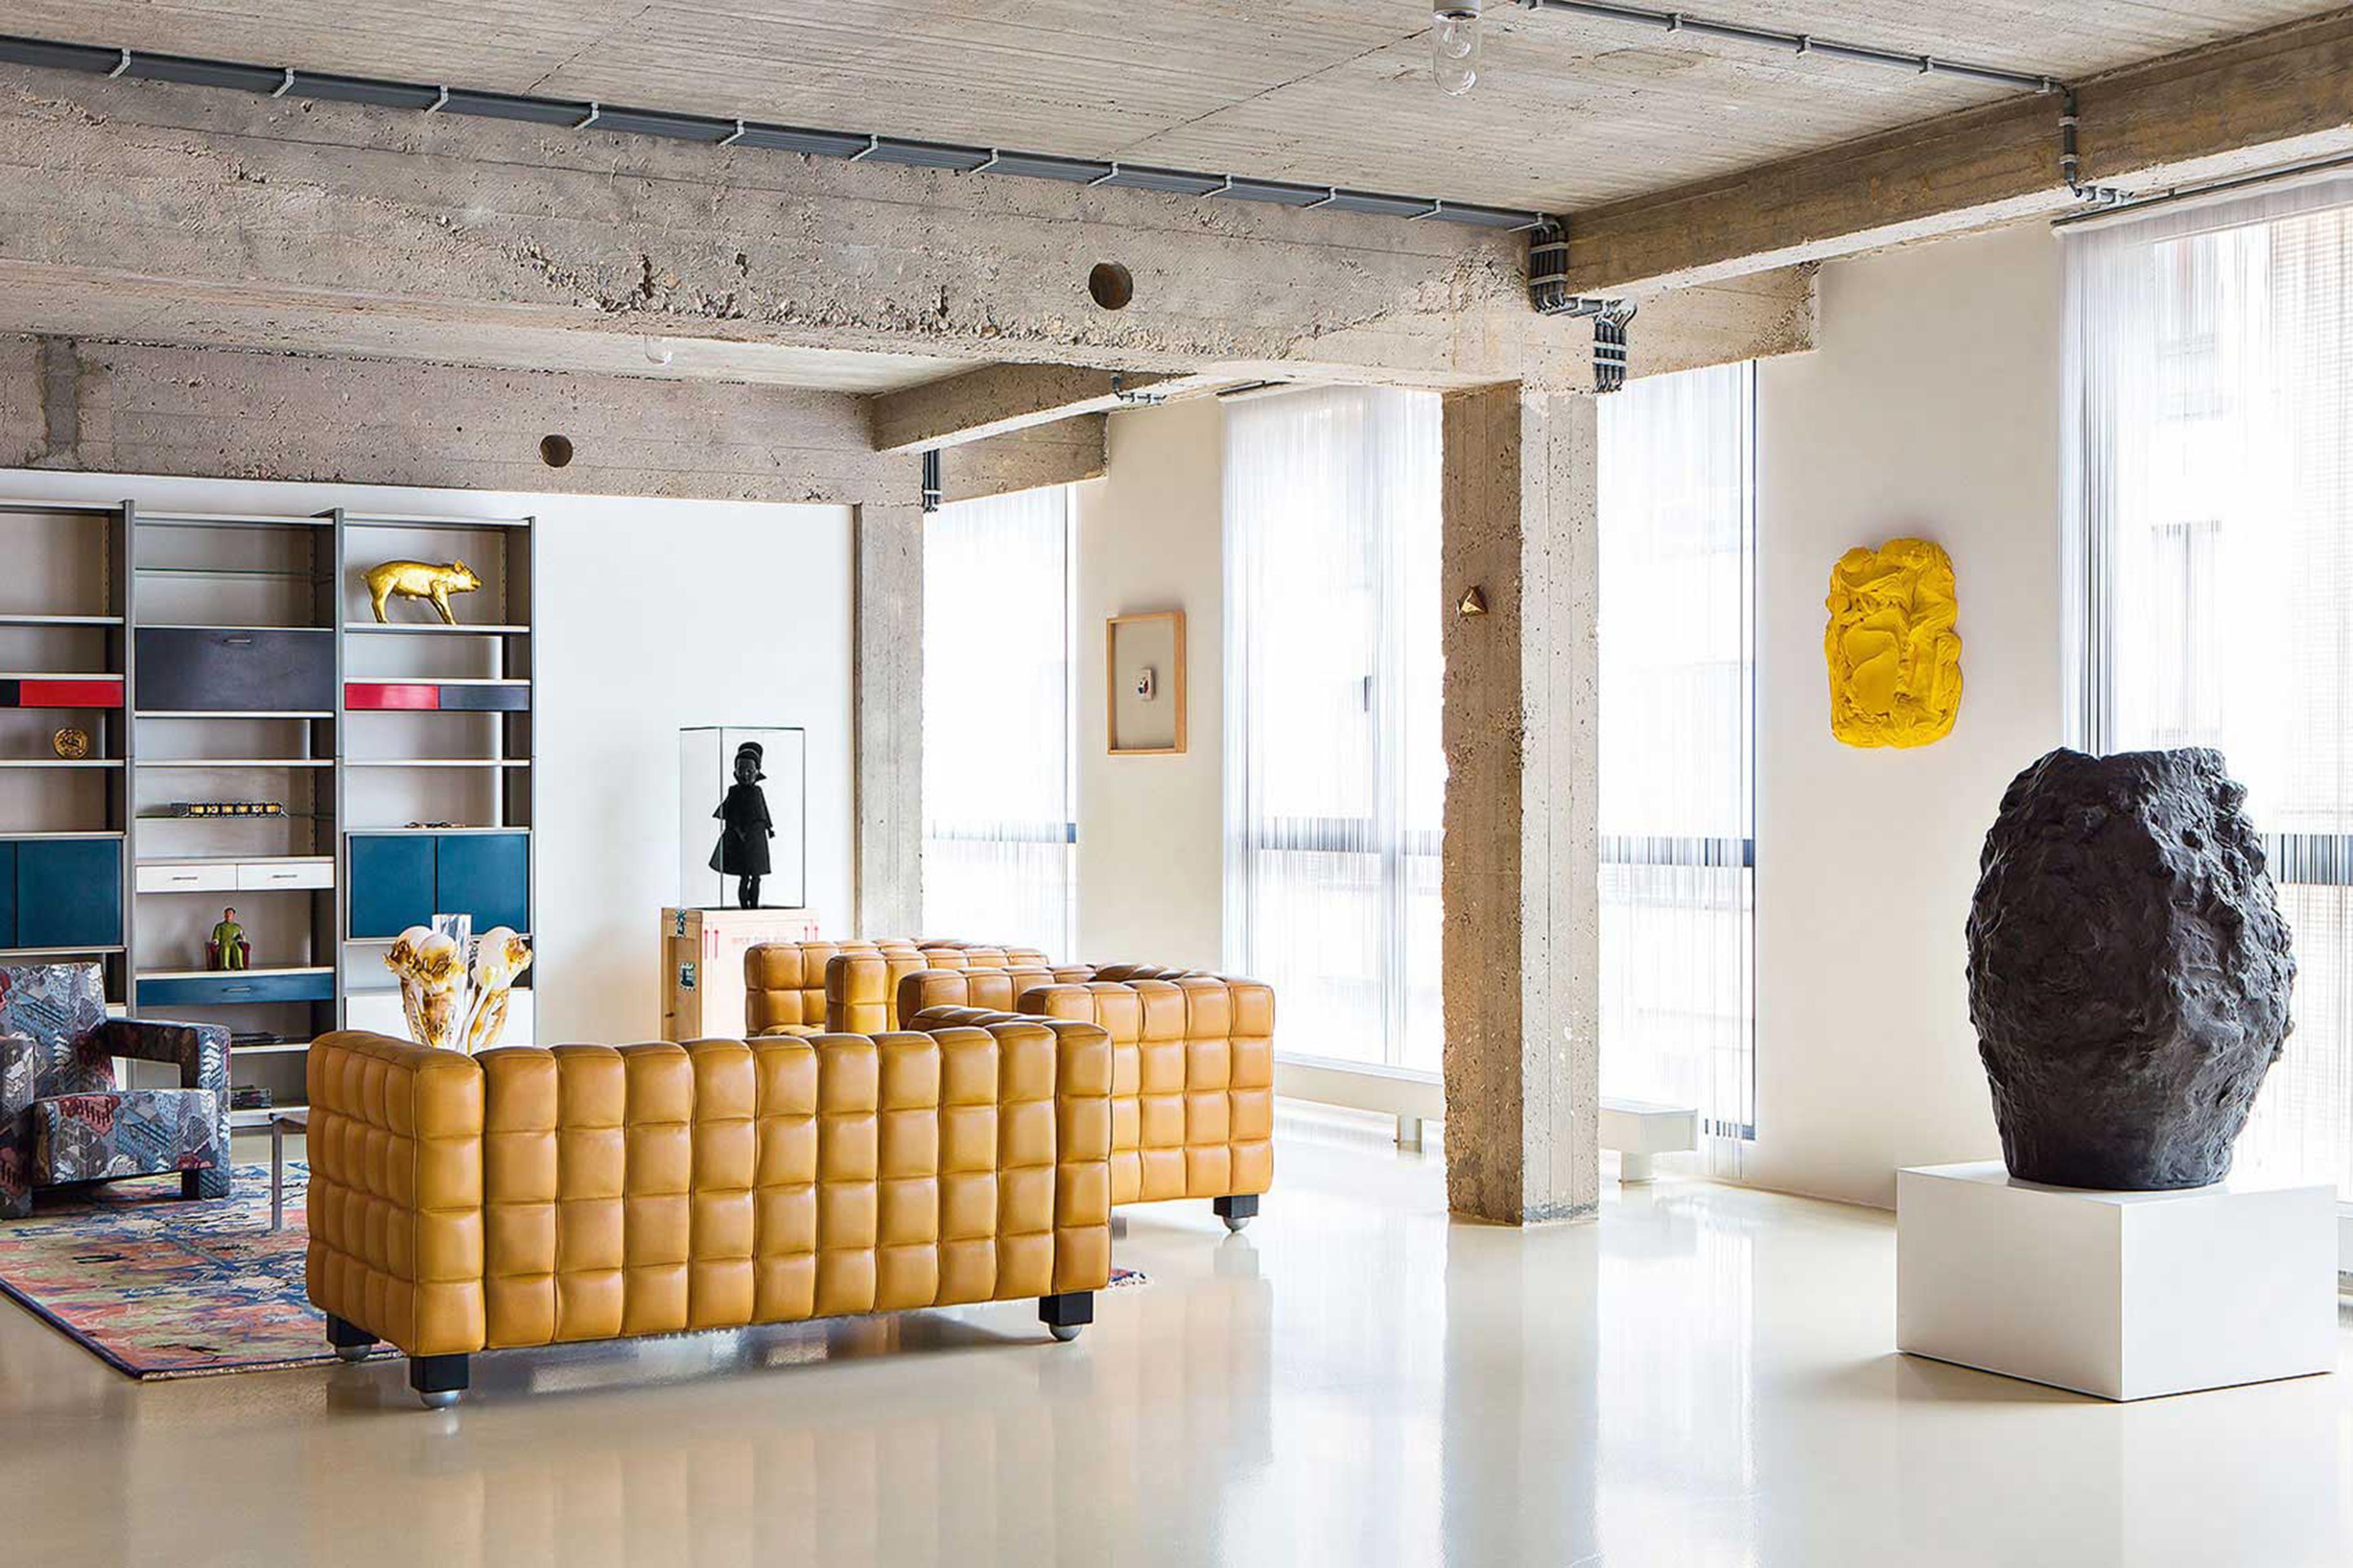 Studio Job 1st floor living photo Ricardo Labougle